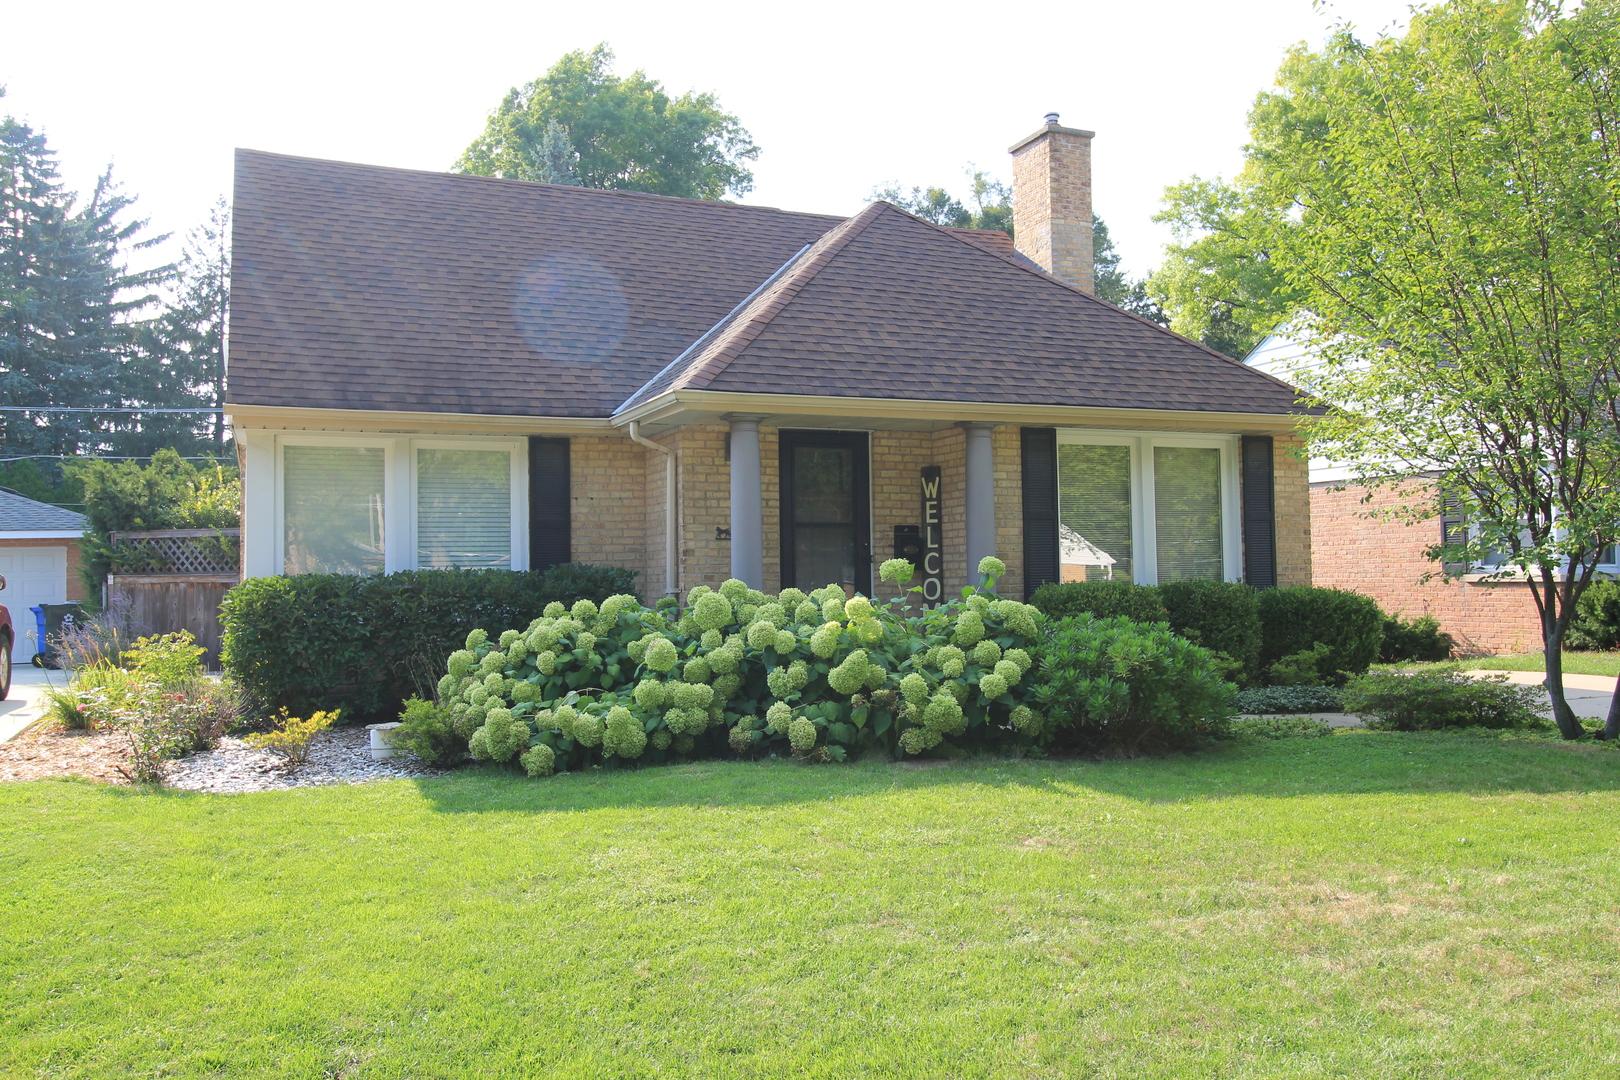 704 South ELMHURST, Mount Prospect, Illinois, 60056